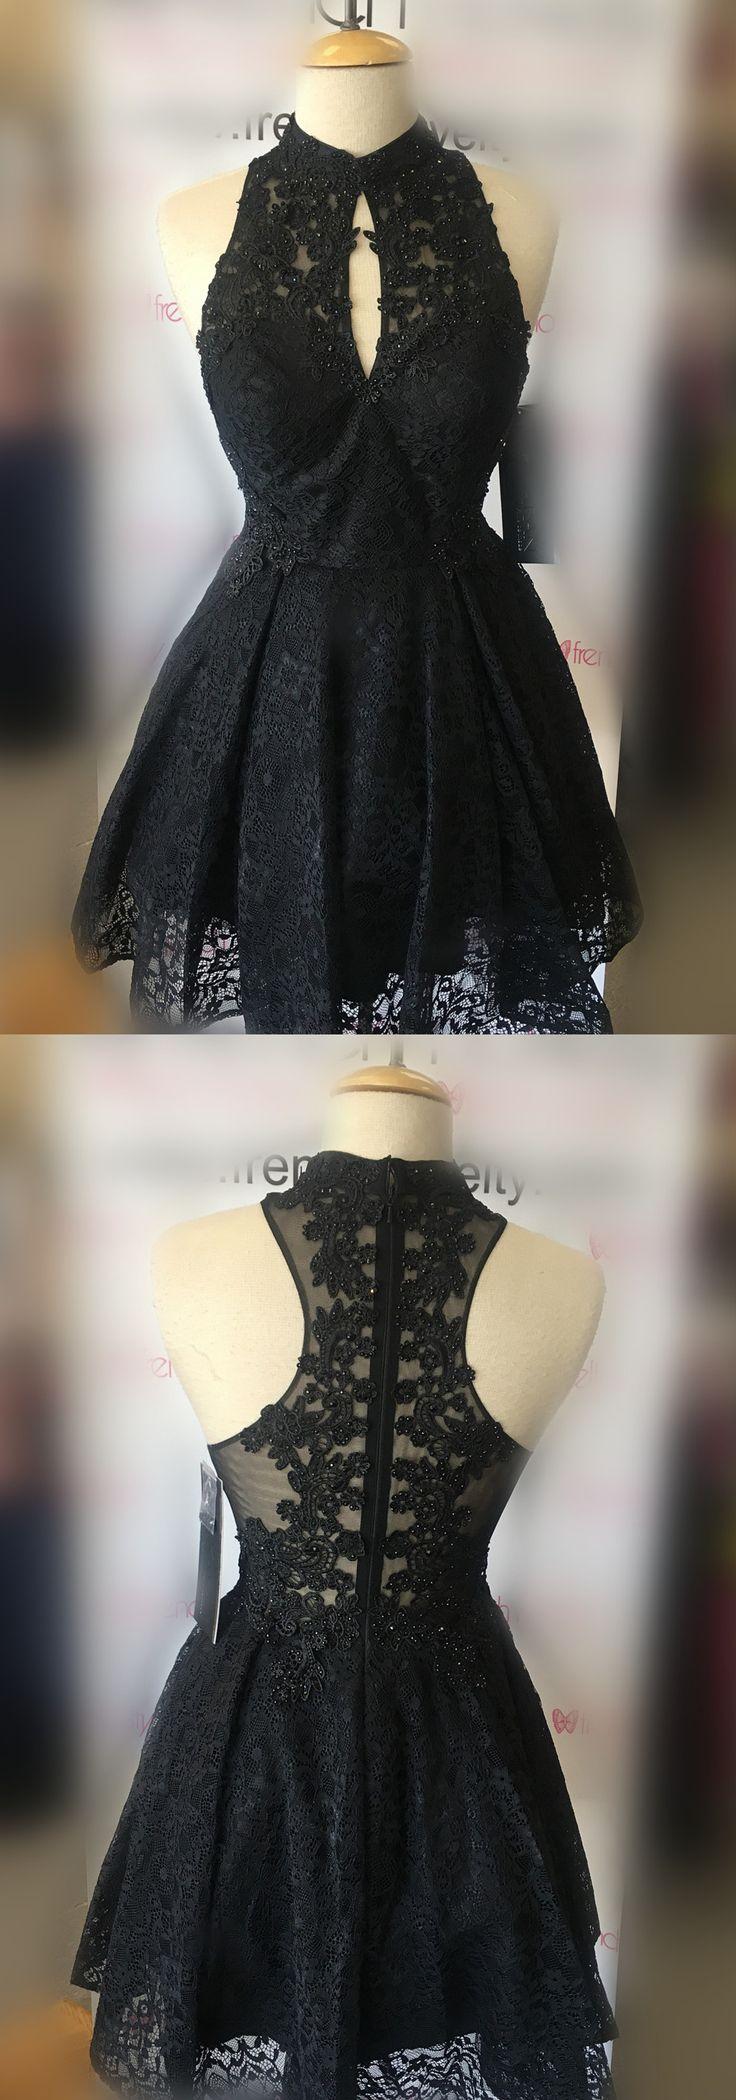 little black dress, short black lace prom dress homecoming dress, 2018 black short prom dress hoco dress, party dress